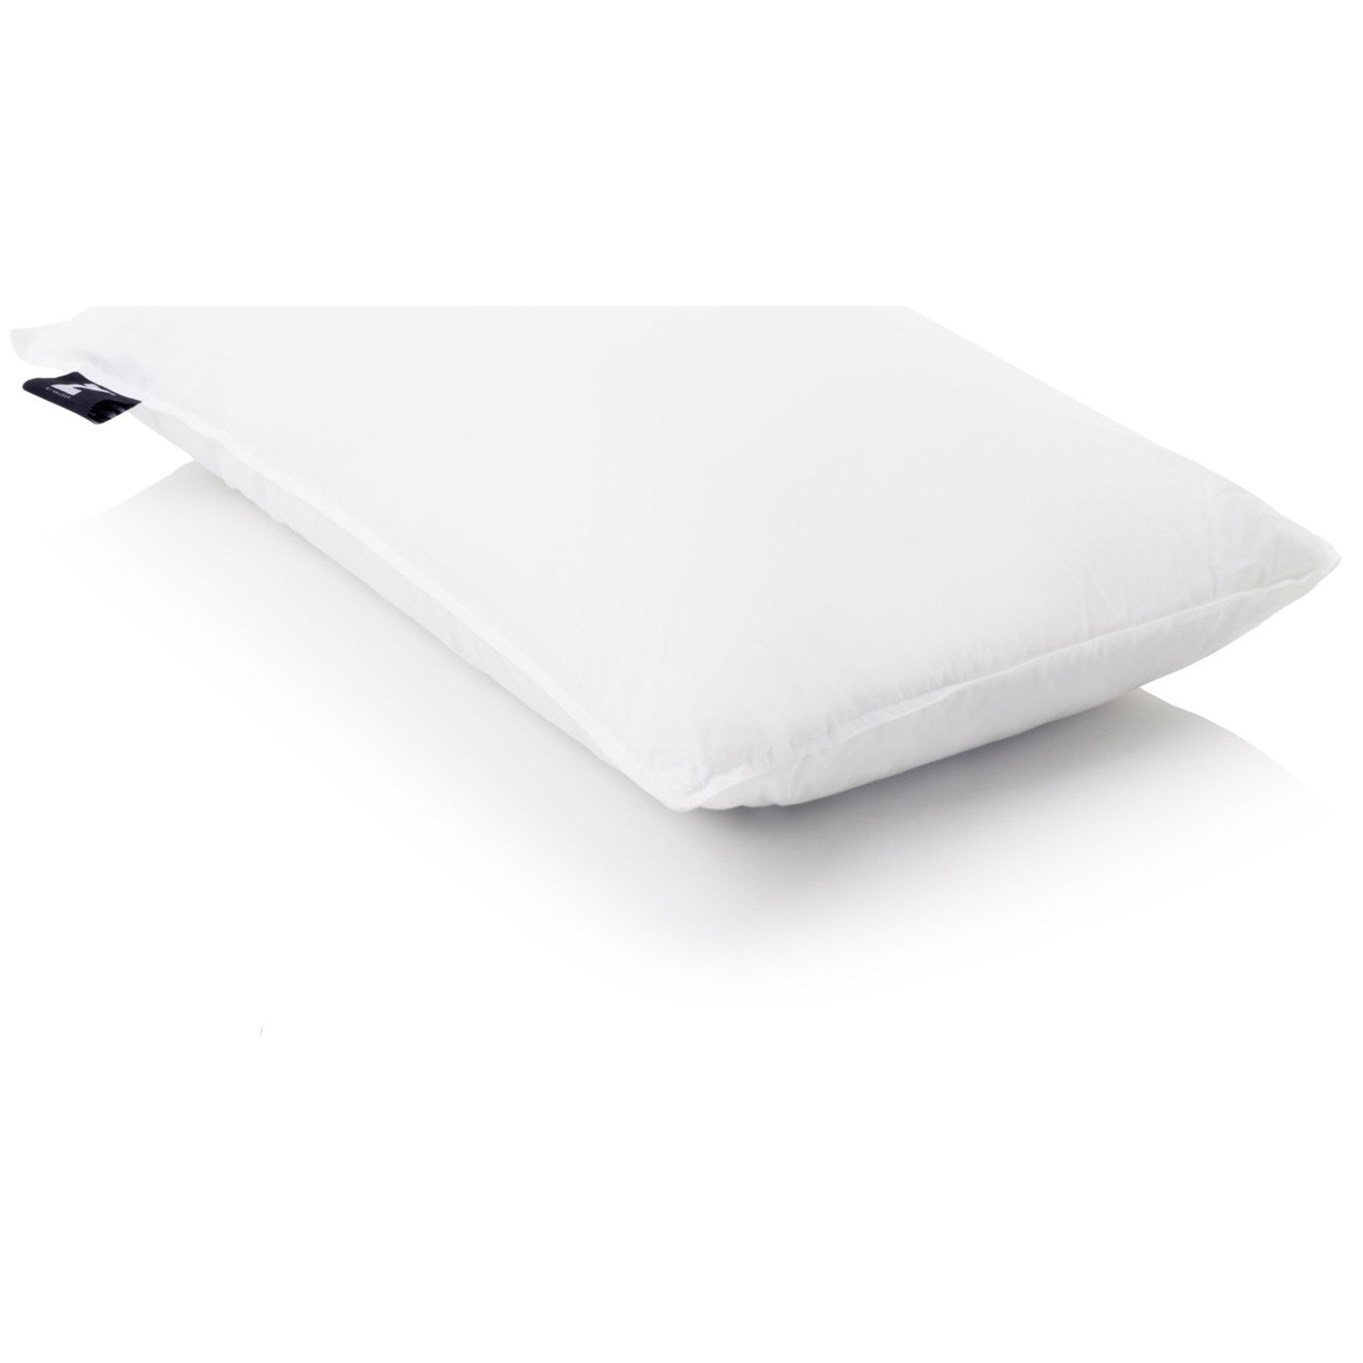 Malouf Gelled Microfiber Standard Gelled Microfiber Pillow - Item Number: ZZSS00GM